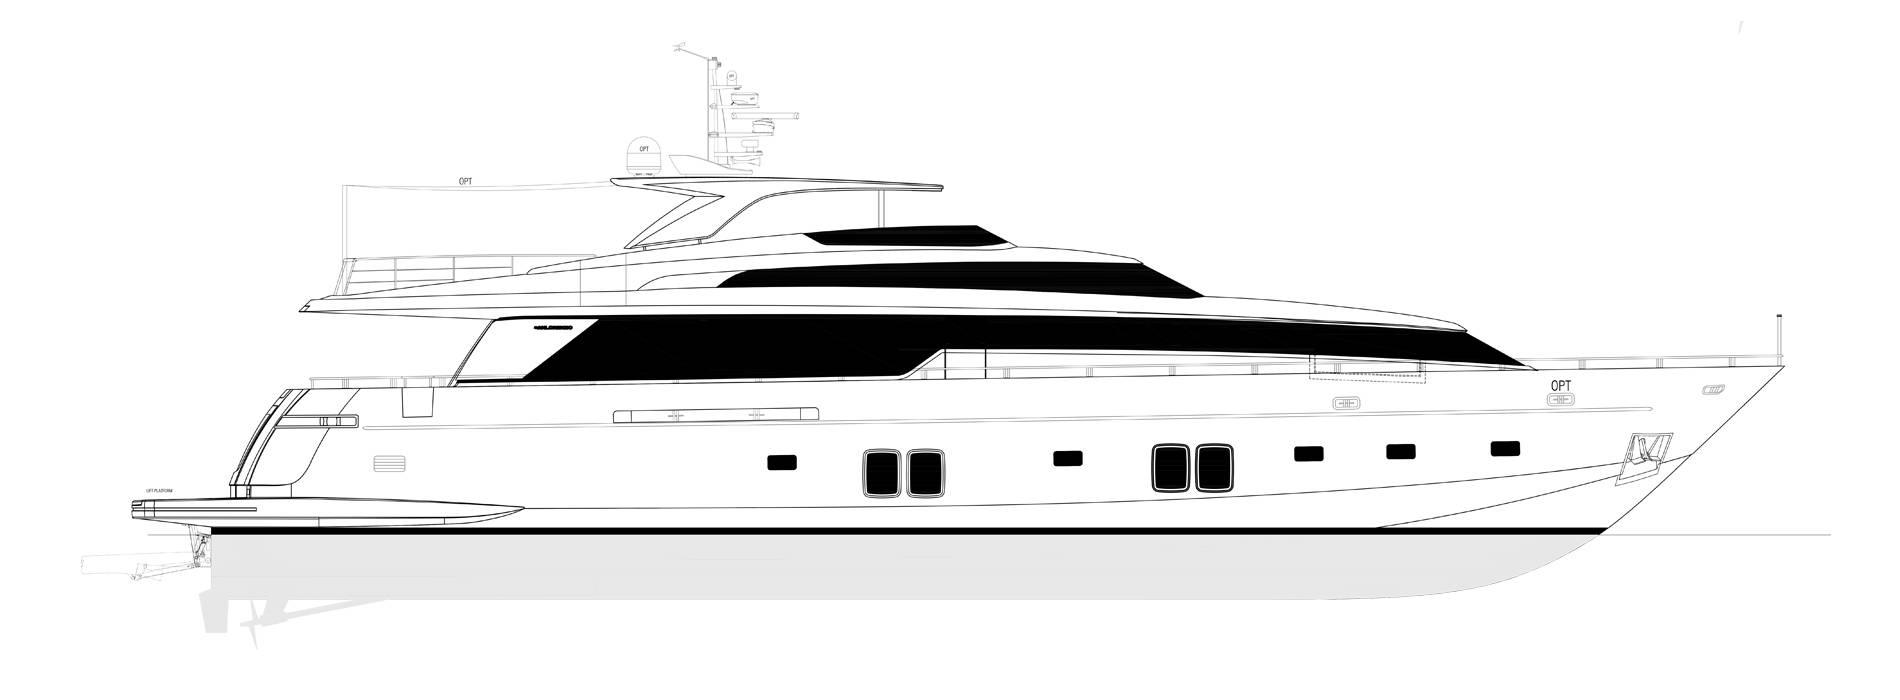 Sanlorenzo Yachts SL106-725 Профиль